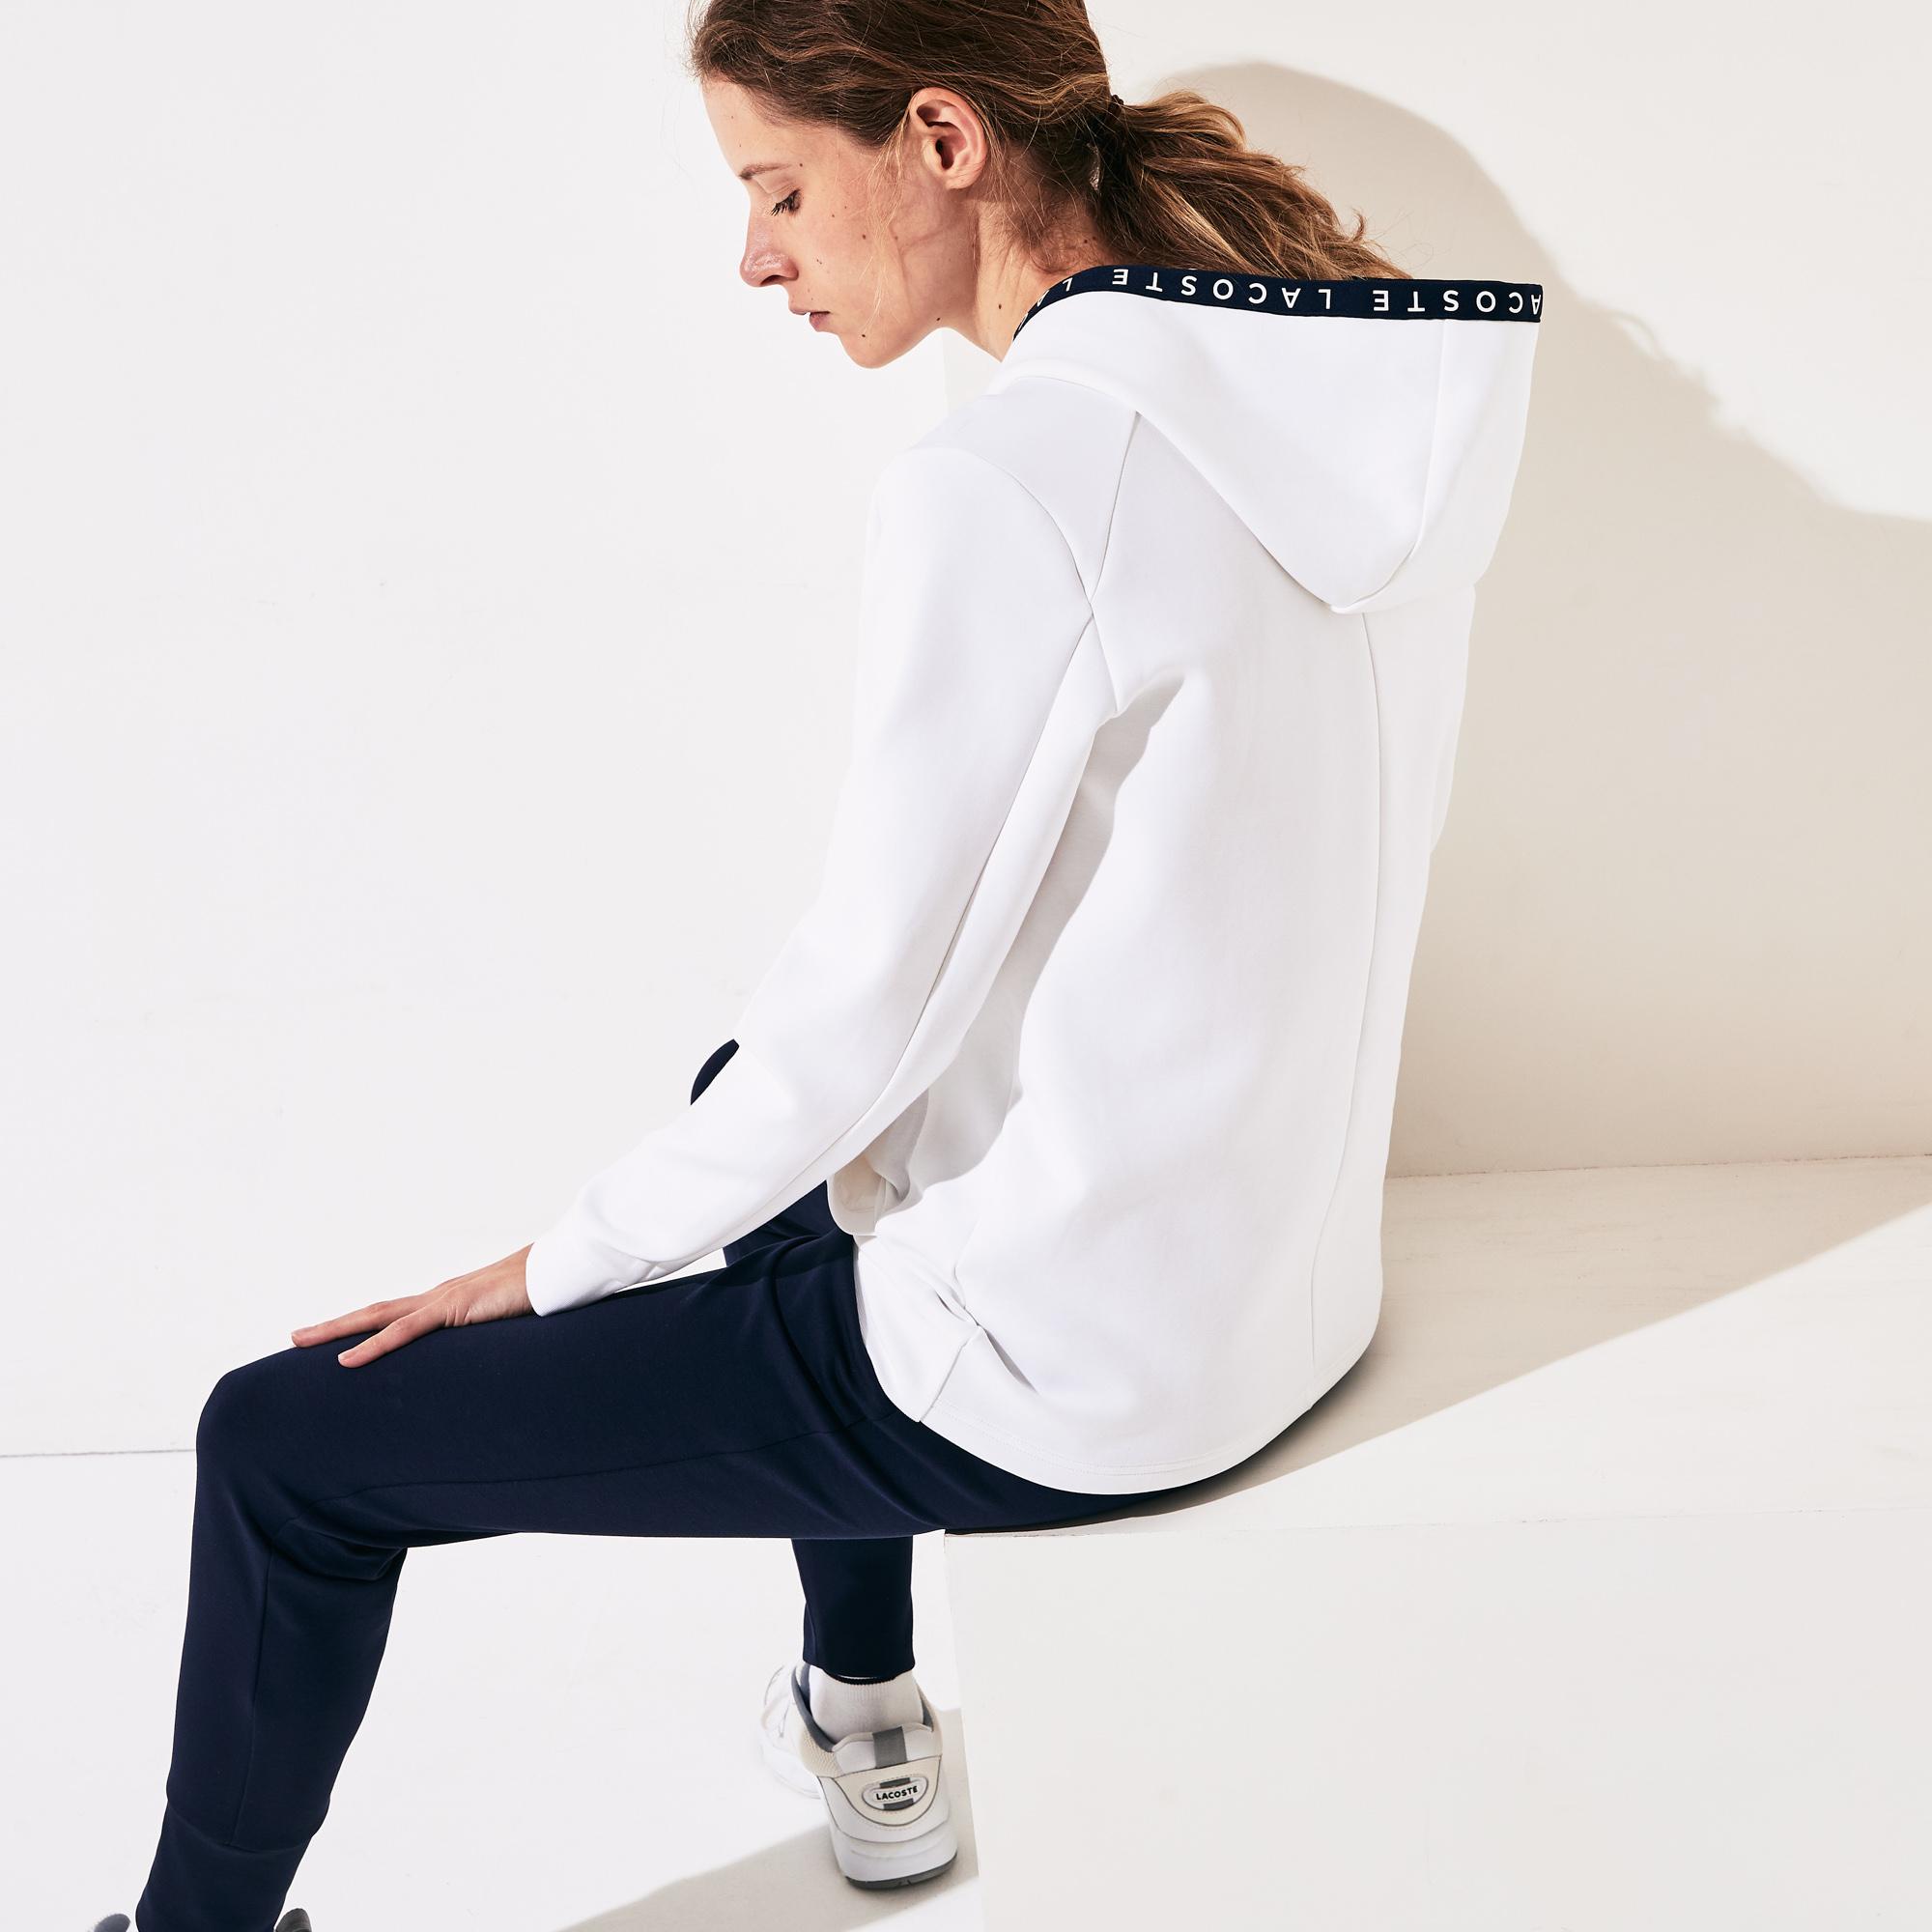 Lacoste Women's SPORT Signature Hooded Tennis Sweatshirt